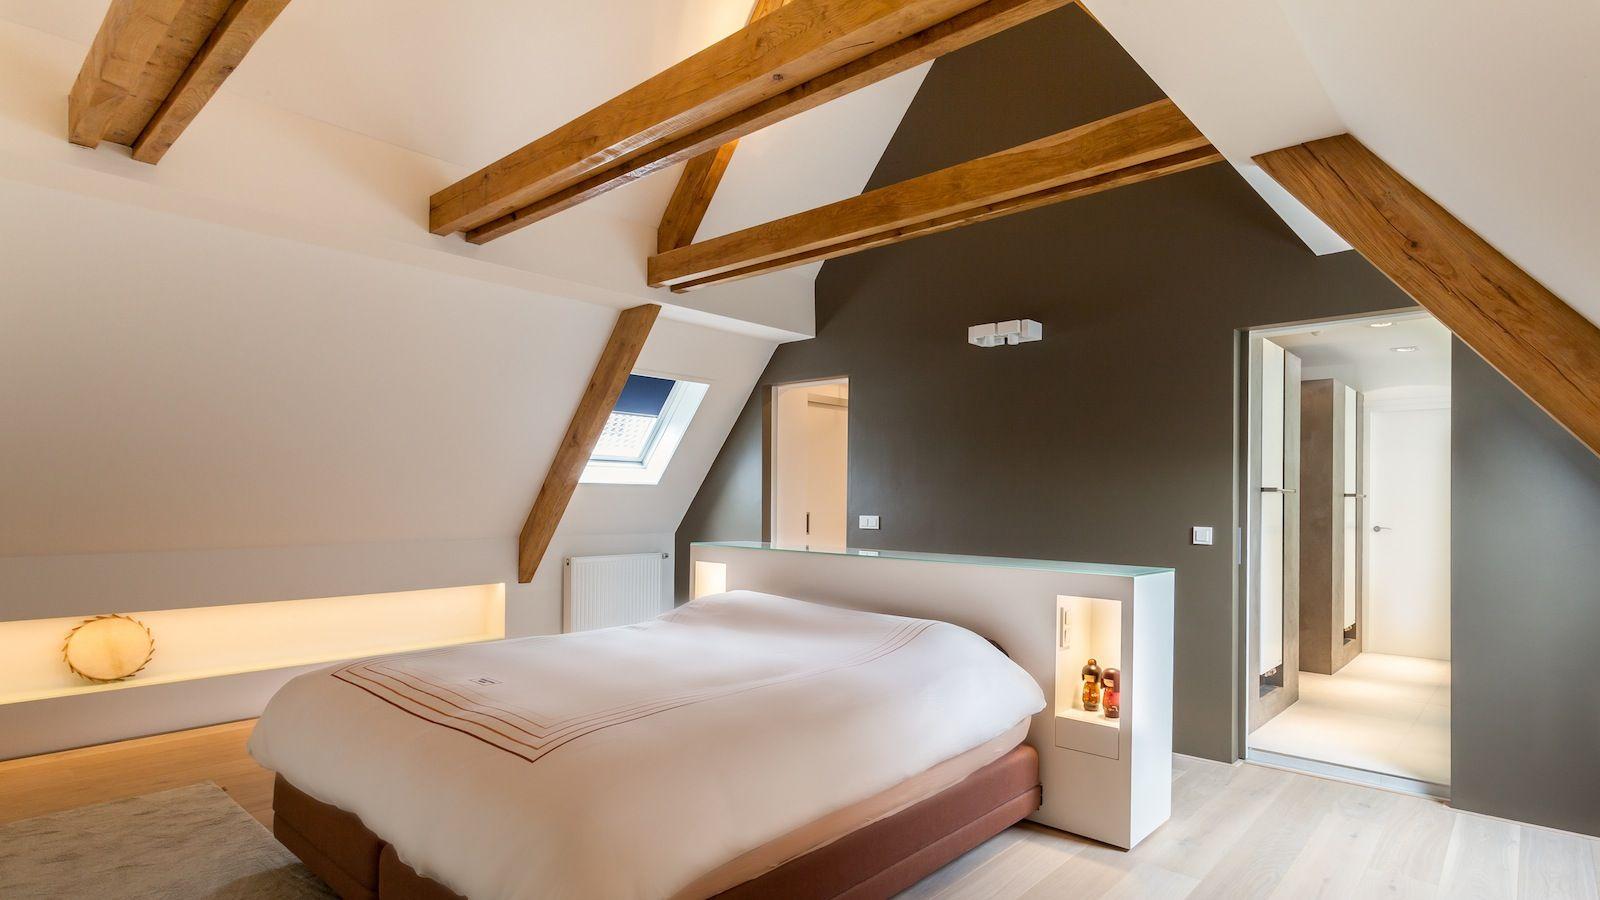 slaapkamer en badkamer ineen | digtotaal, Badkamer